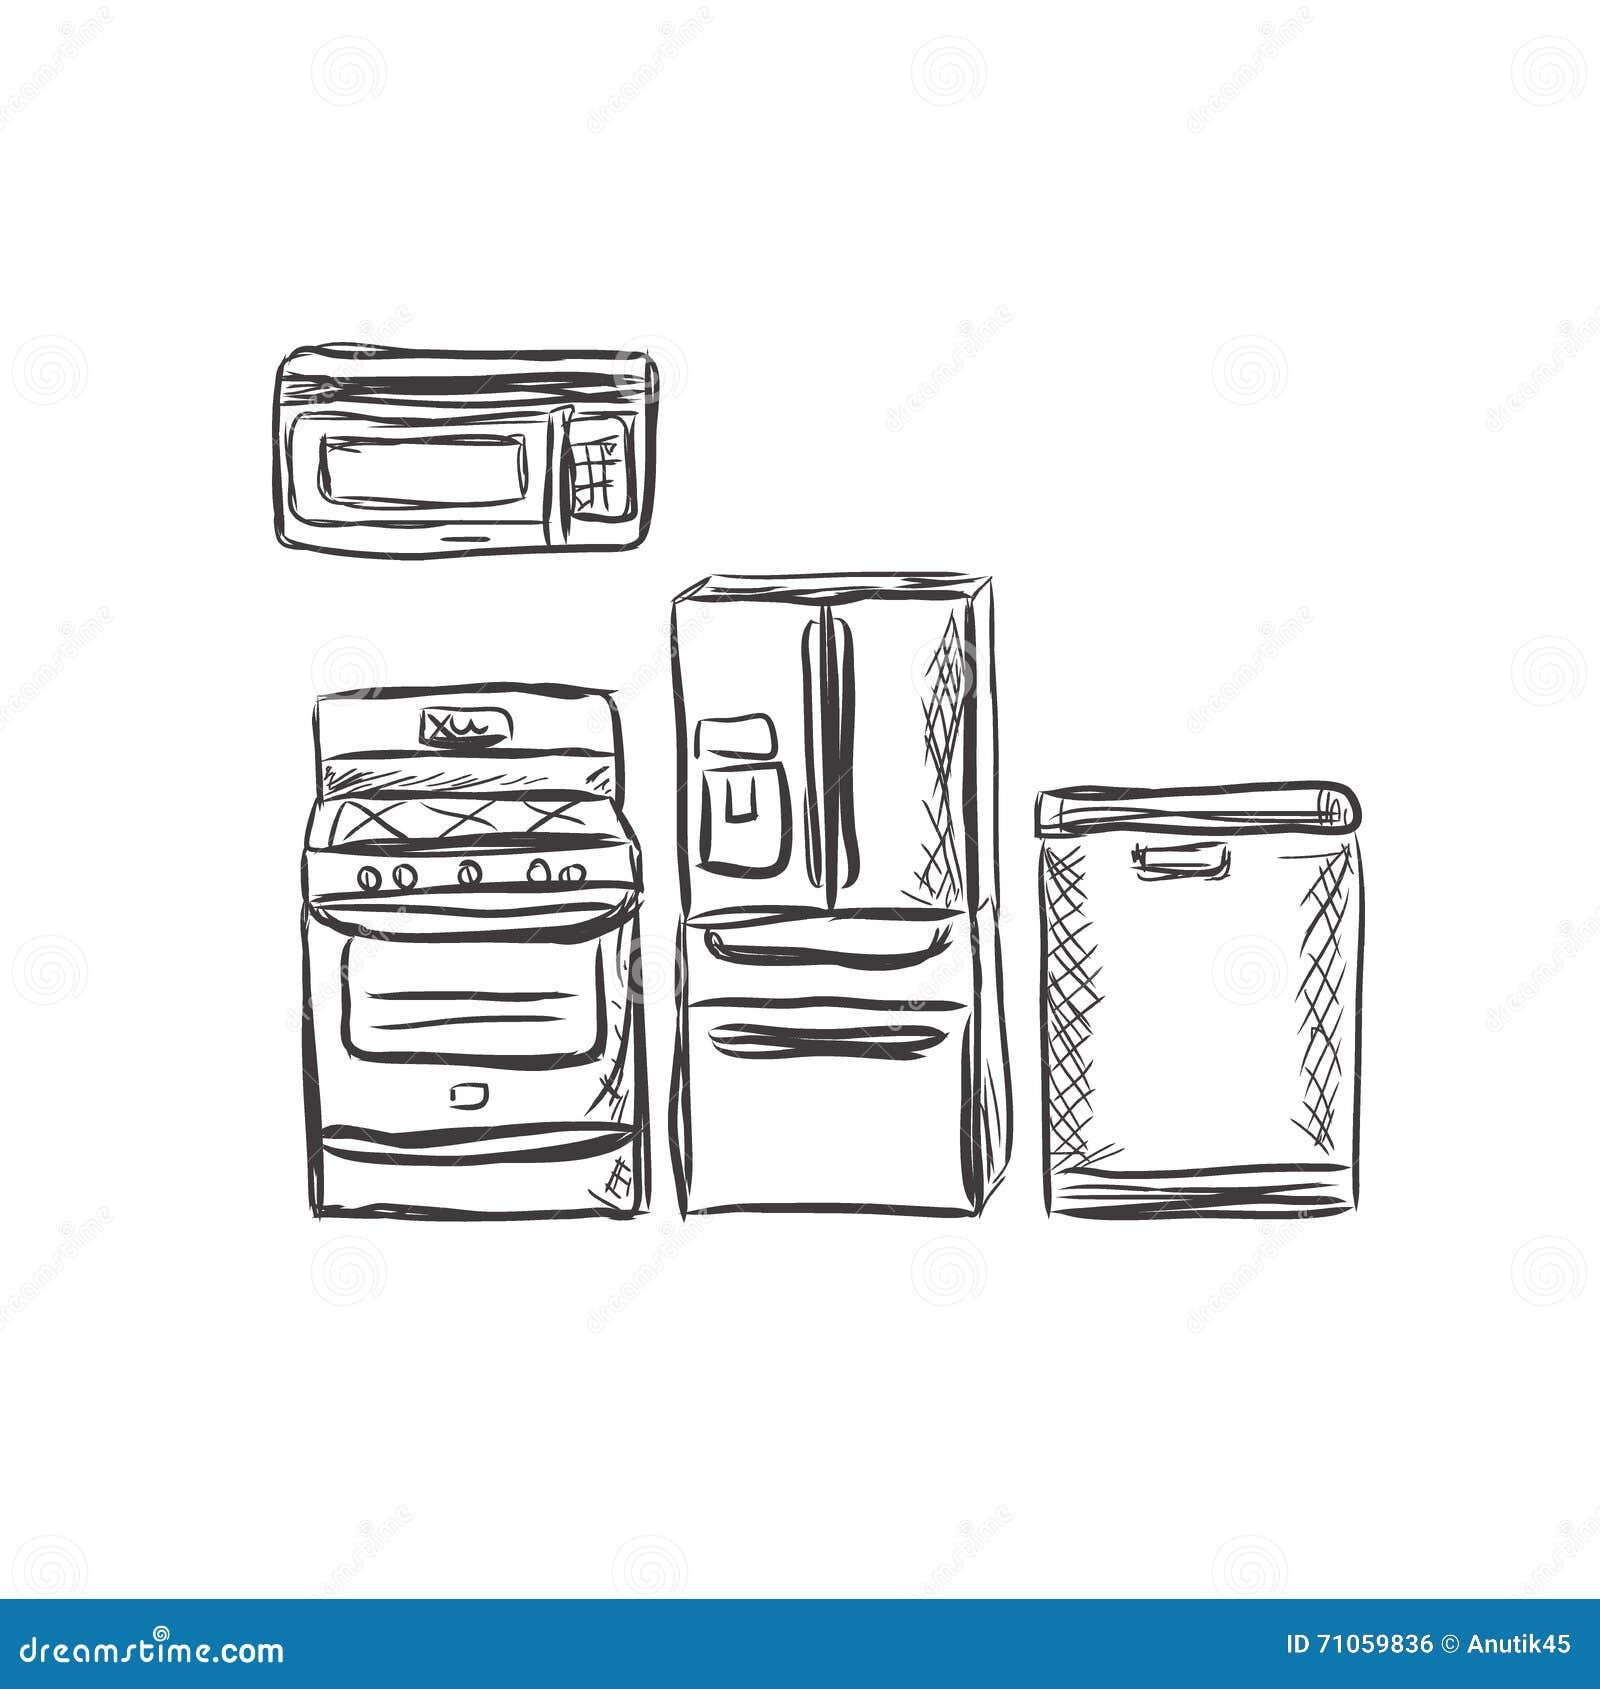 Illustration household appliances stock photo for Household refrigerator design